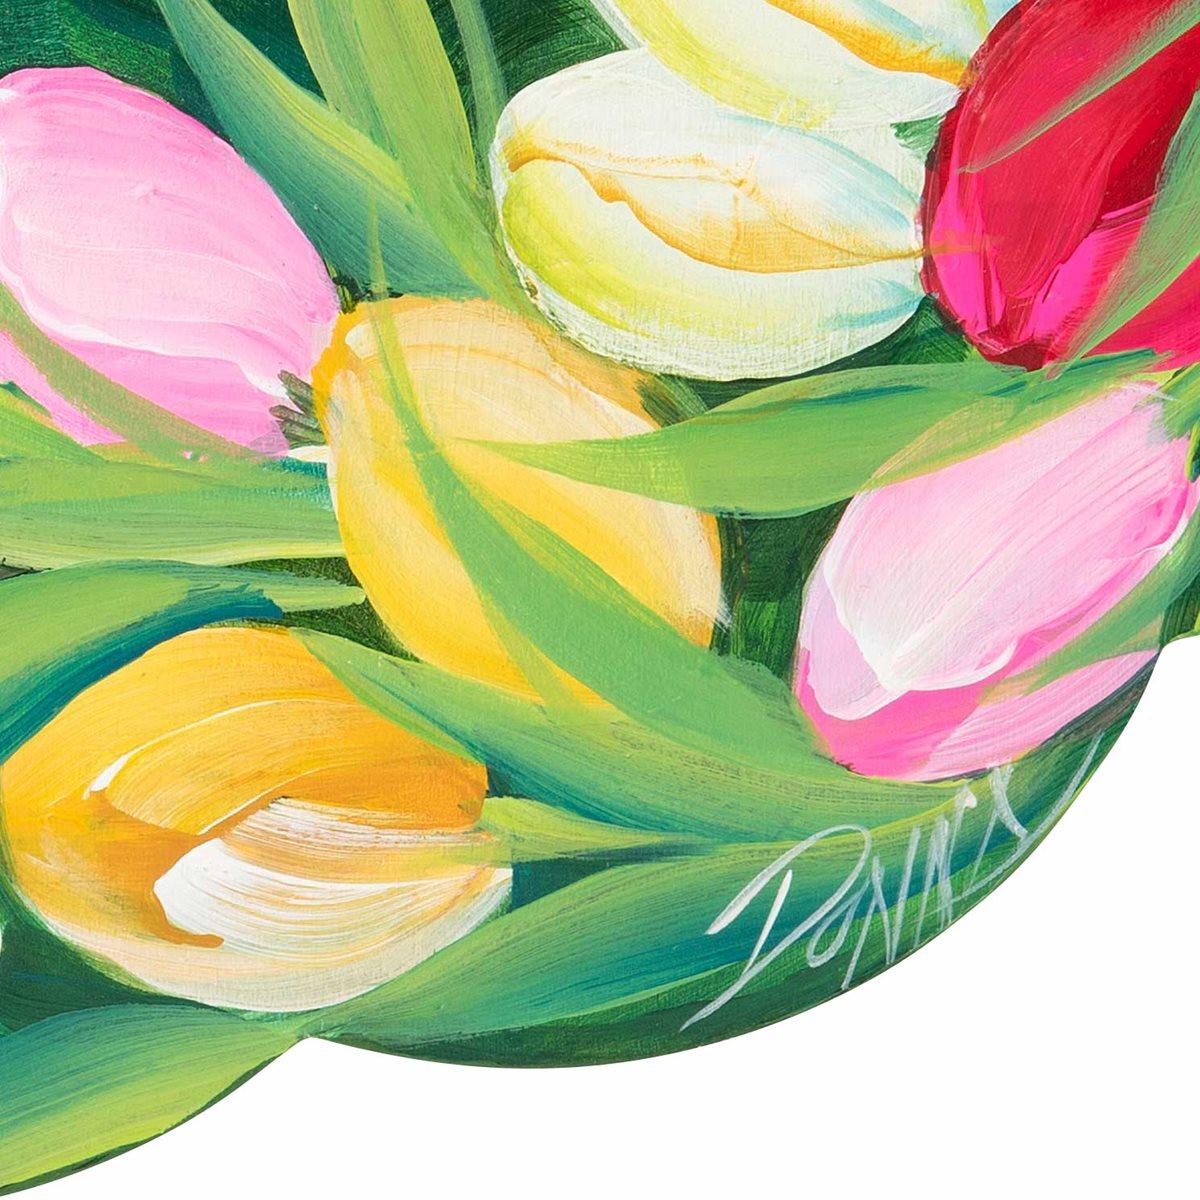 Tulips All Around